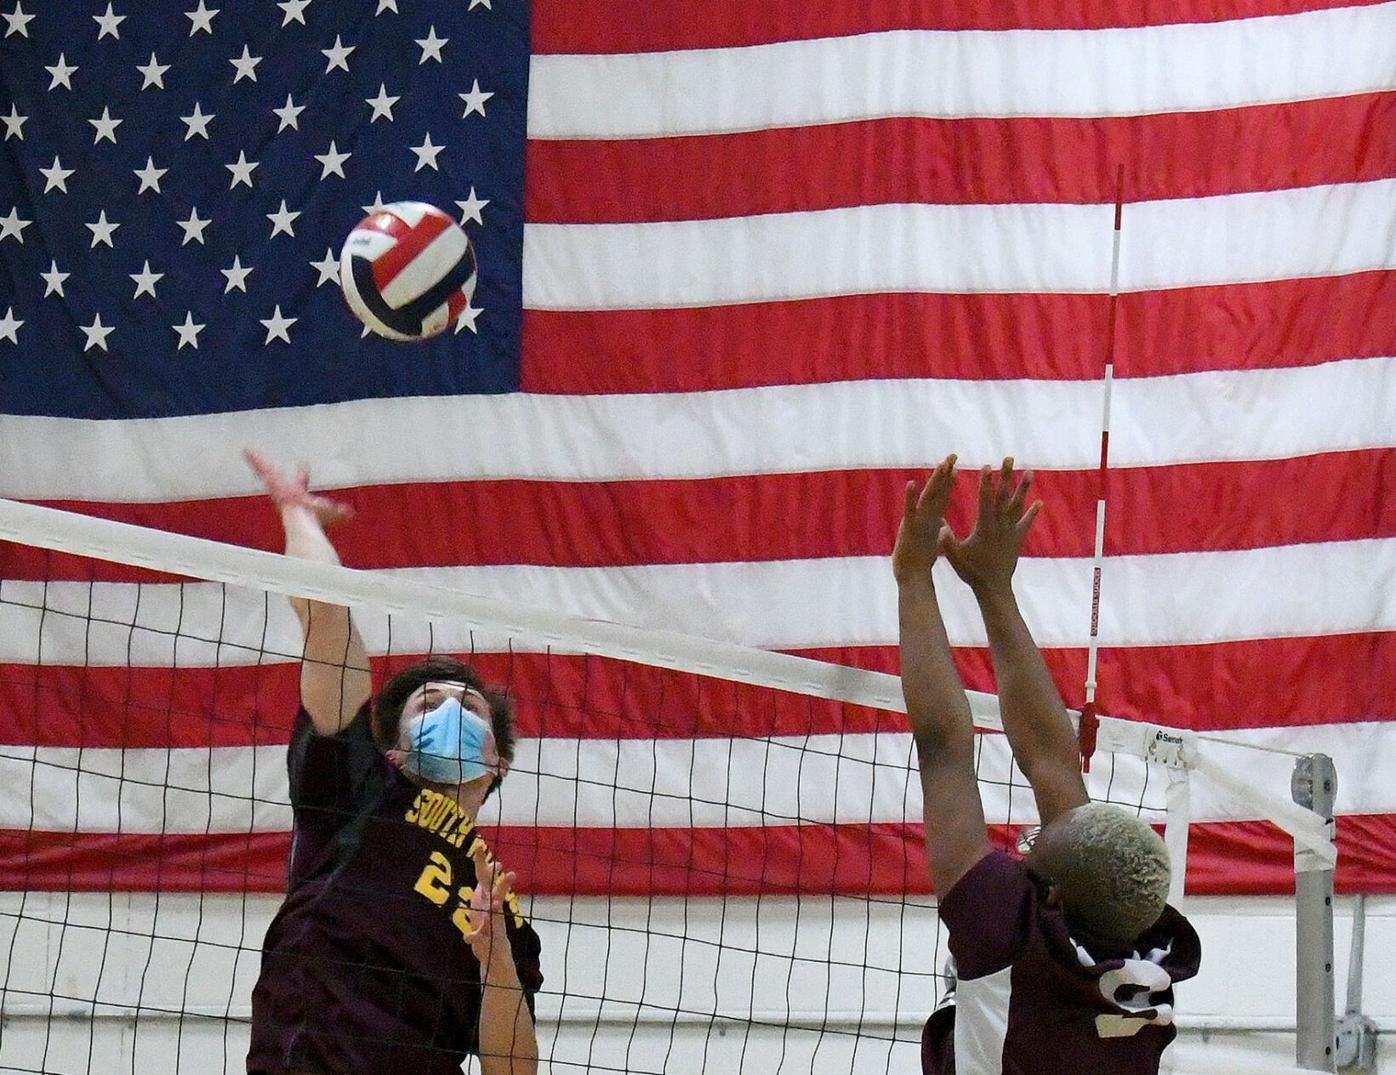 042121 SW NB Volleyball 01.jpg